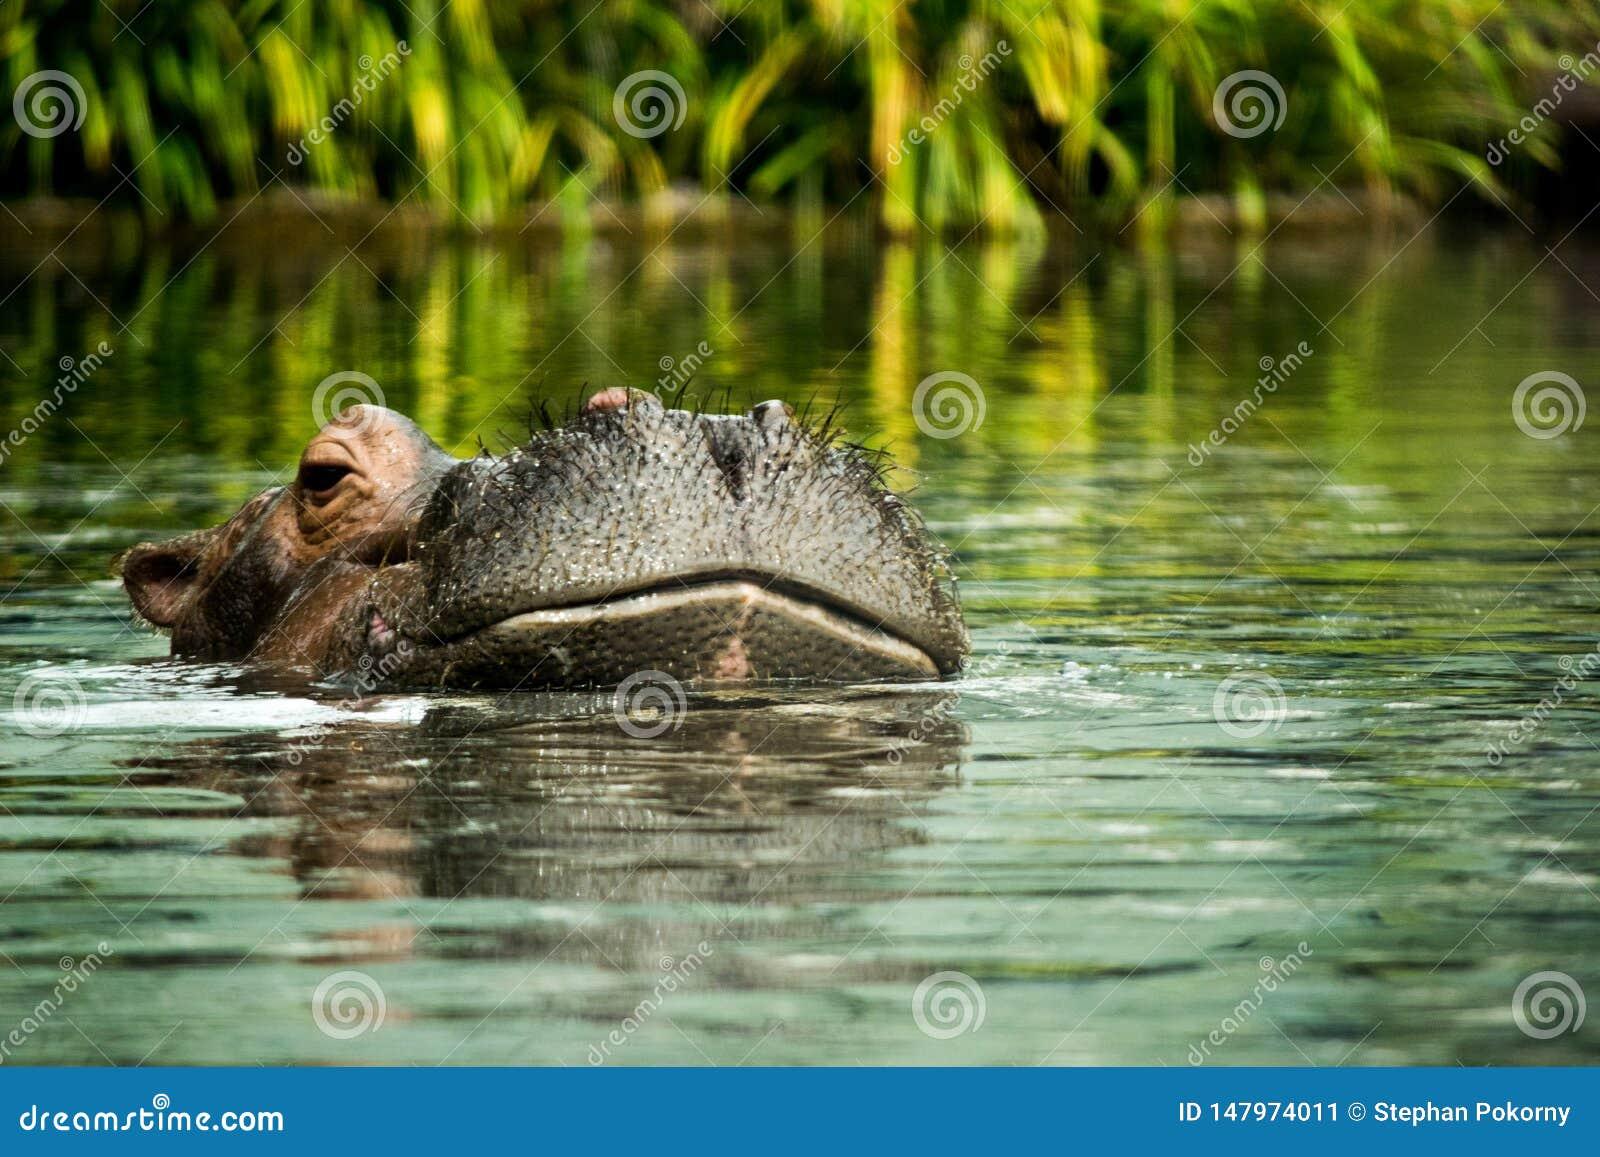 Hippopotamus στο νερό που παρουσιάζει ακριβώς το κεφάλι